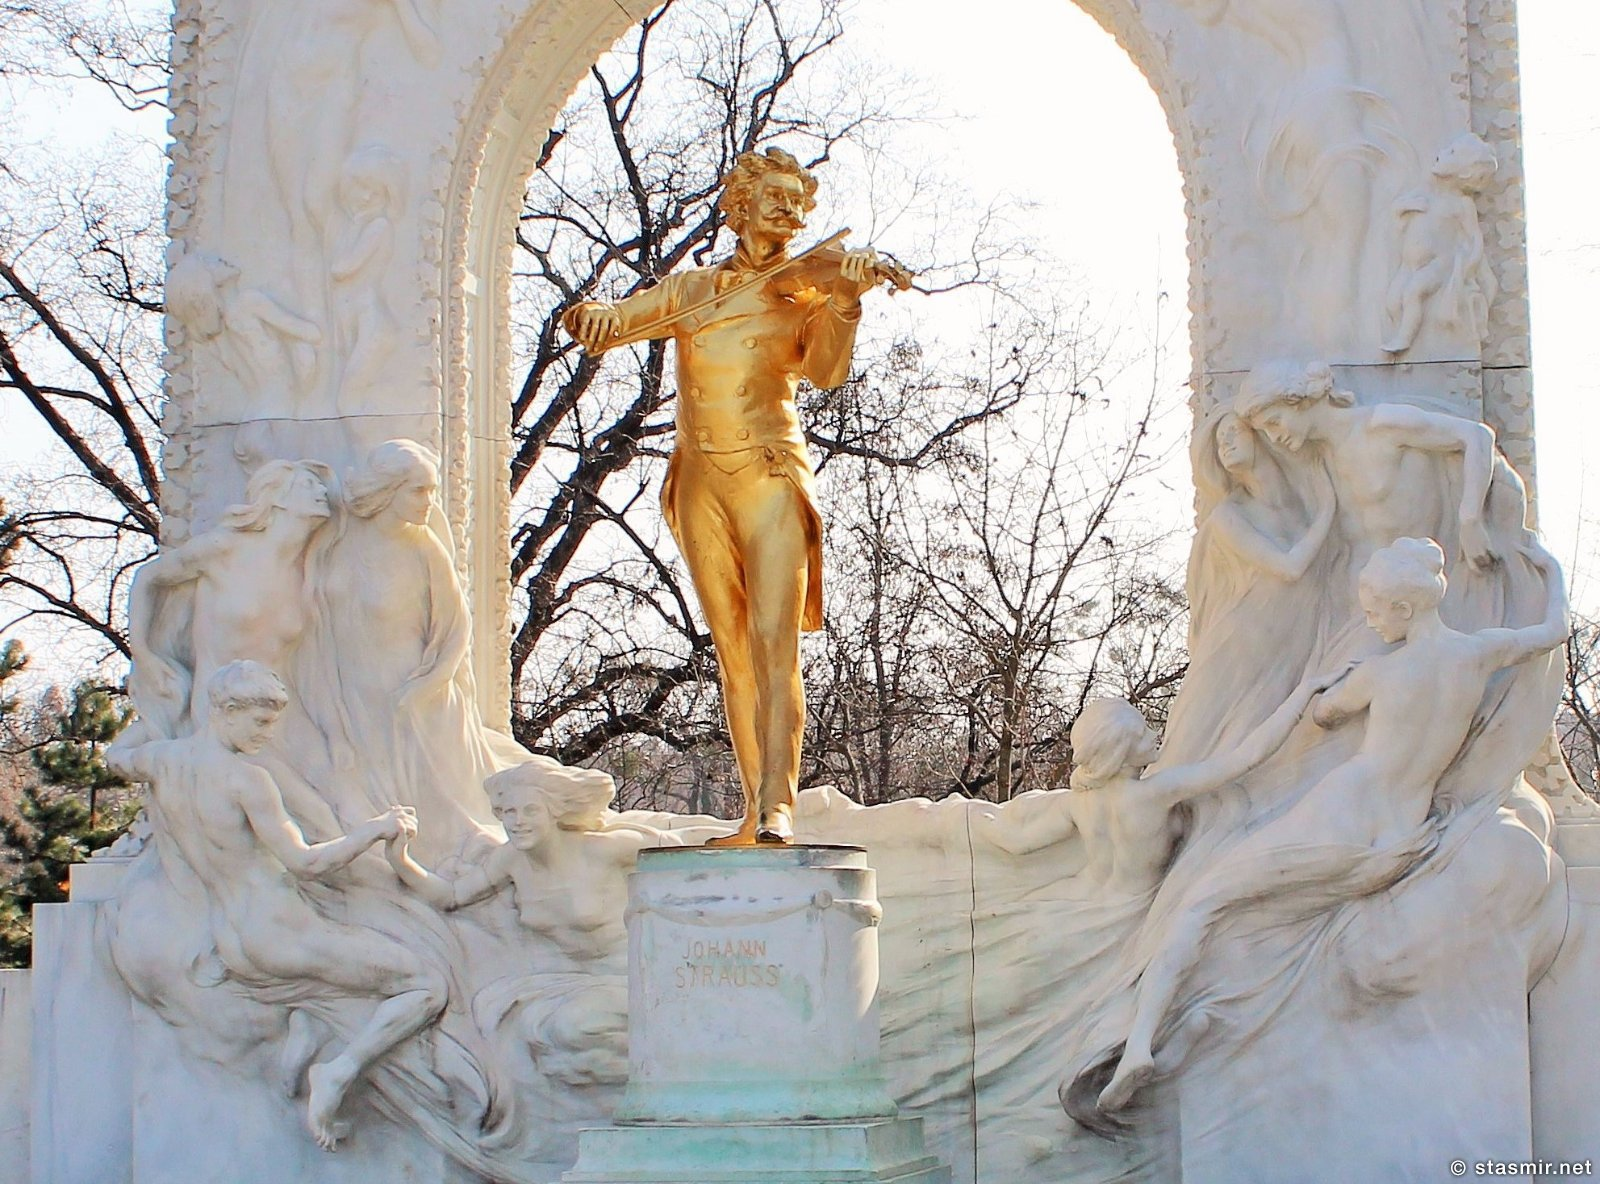 Венна, памятник Моцарту, Австрия, фото Стасмир, Photo Stasmir